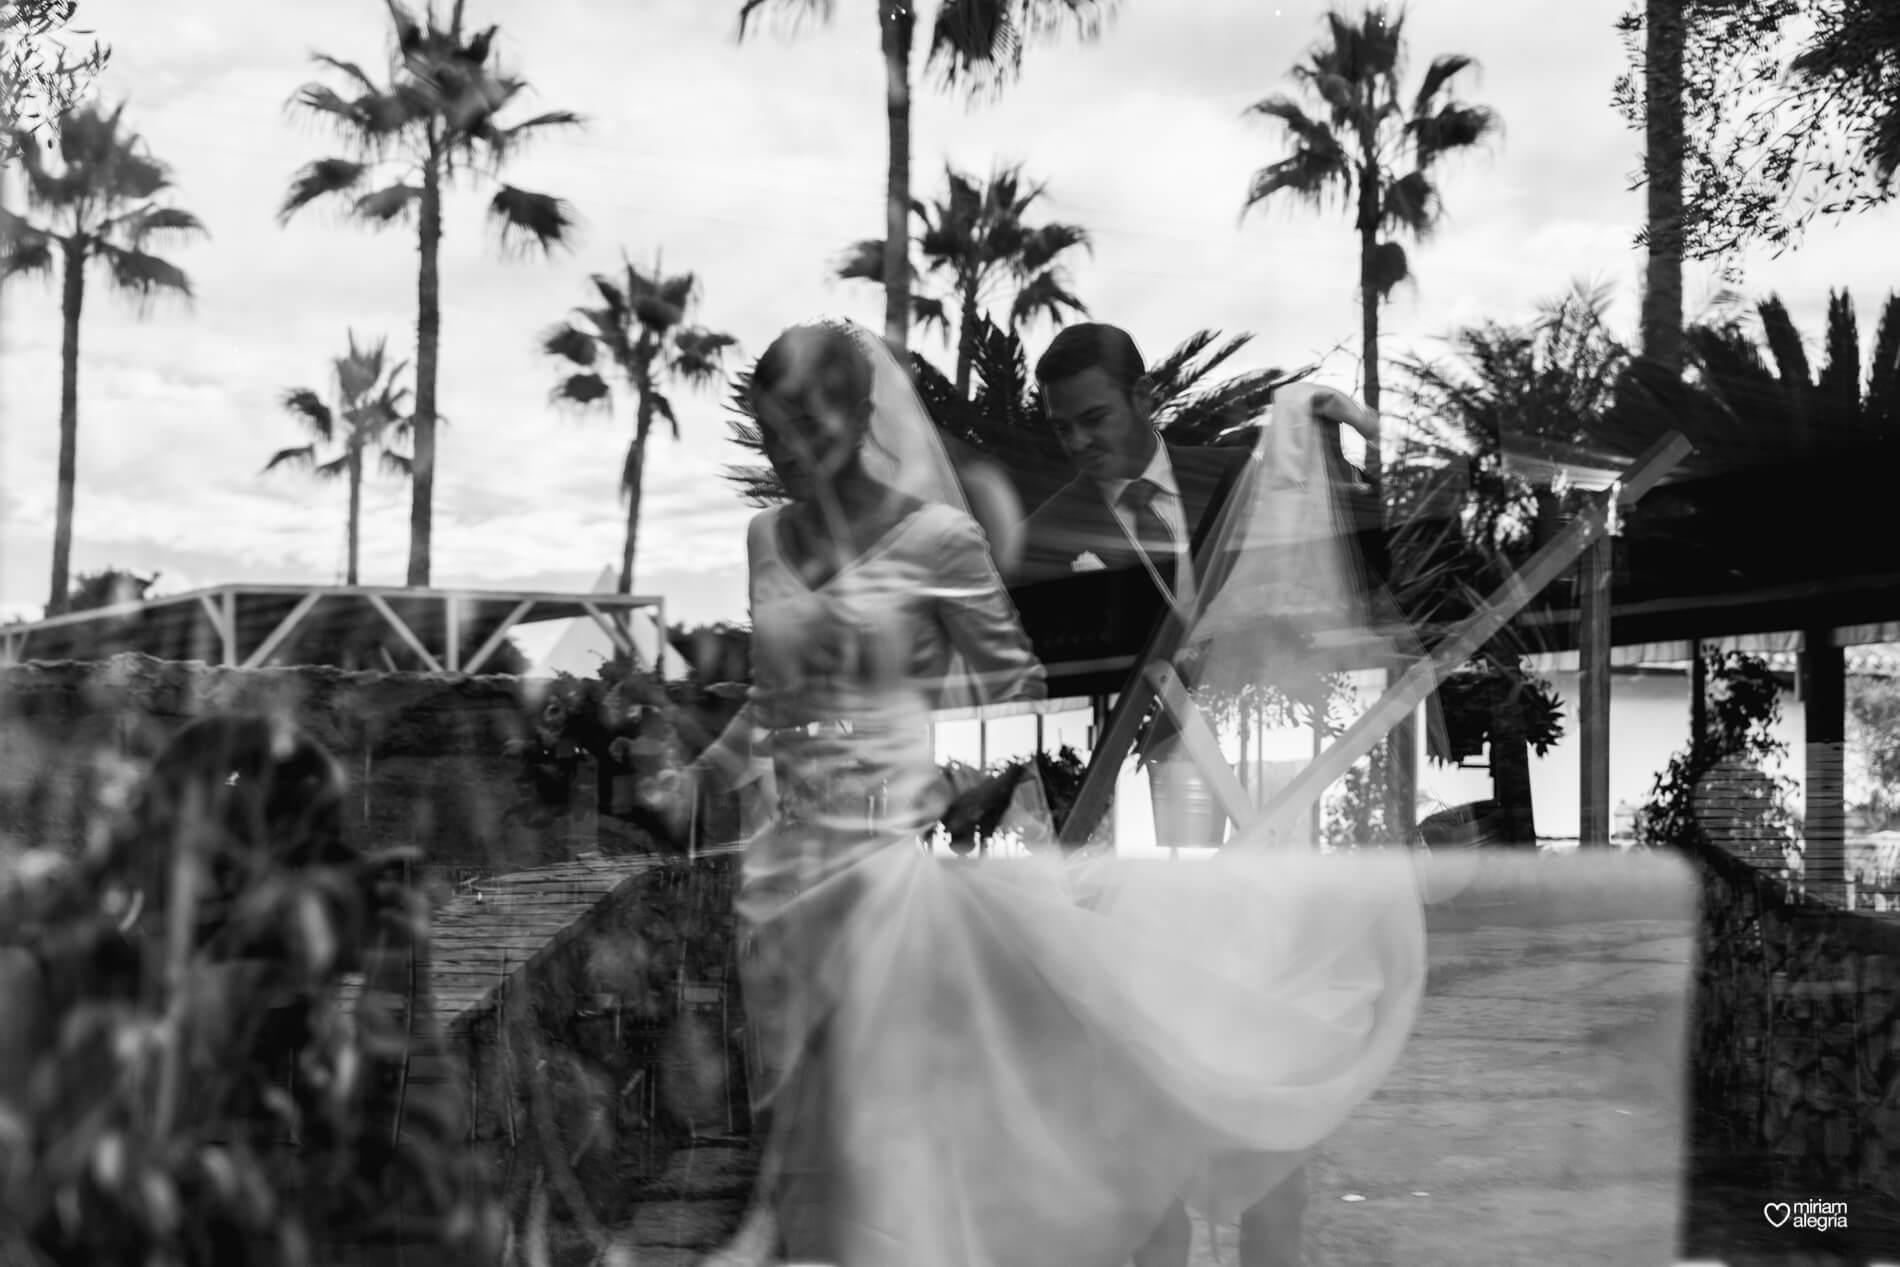 vestido-de-novia-paula-del-vas-miriam-alegria-fotografos-boda-murcia-97